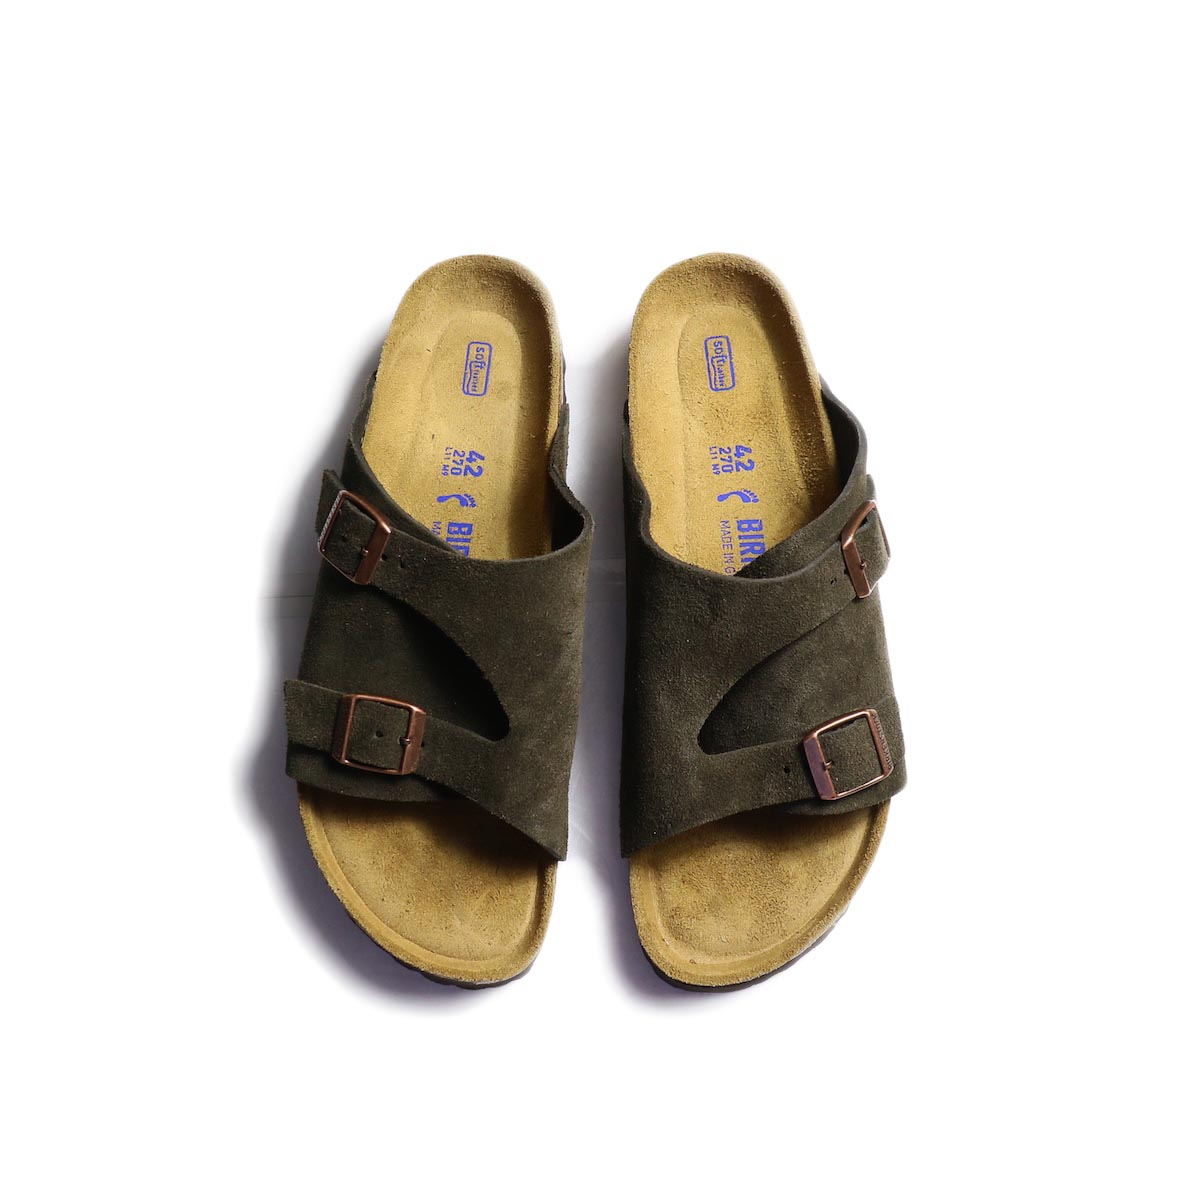 BIRKENSTOCK / Zurich Soft Footbed -Mocha 正面